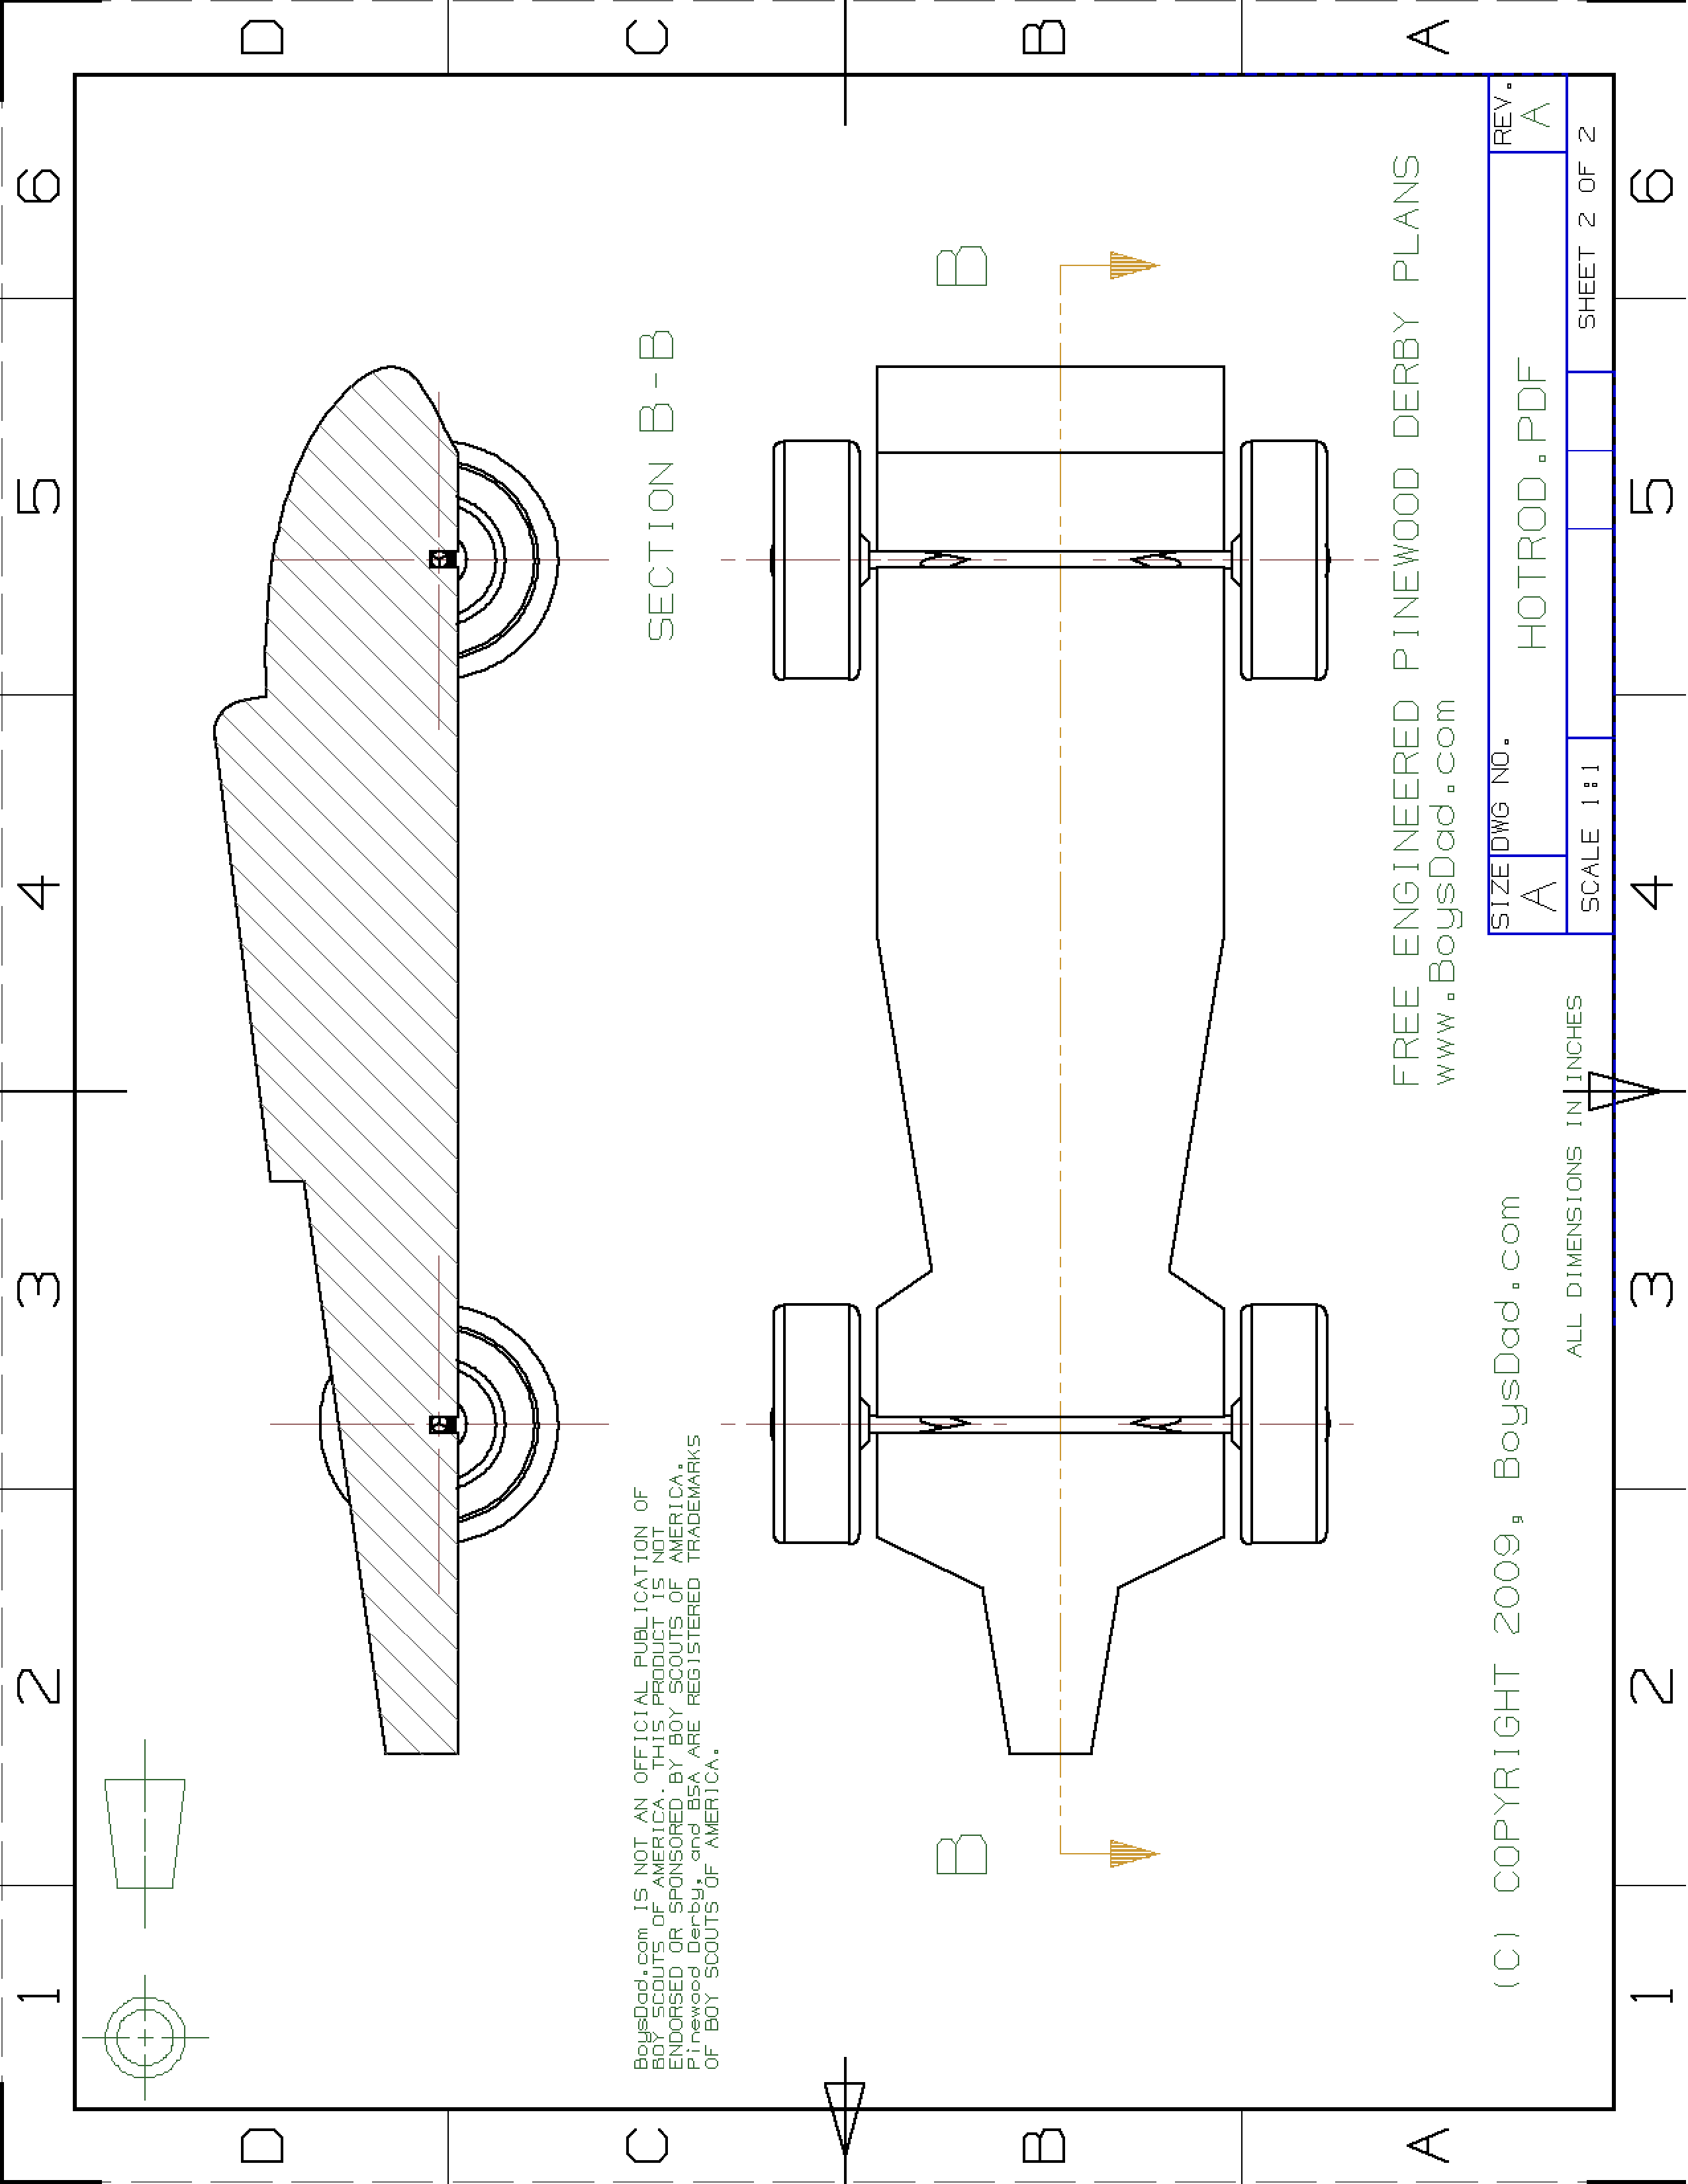 Race car design template racecar design template for Formula 1 pinewood derby car template